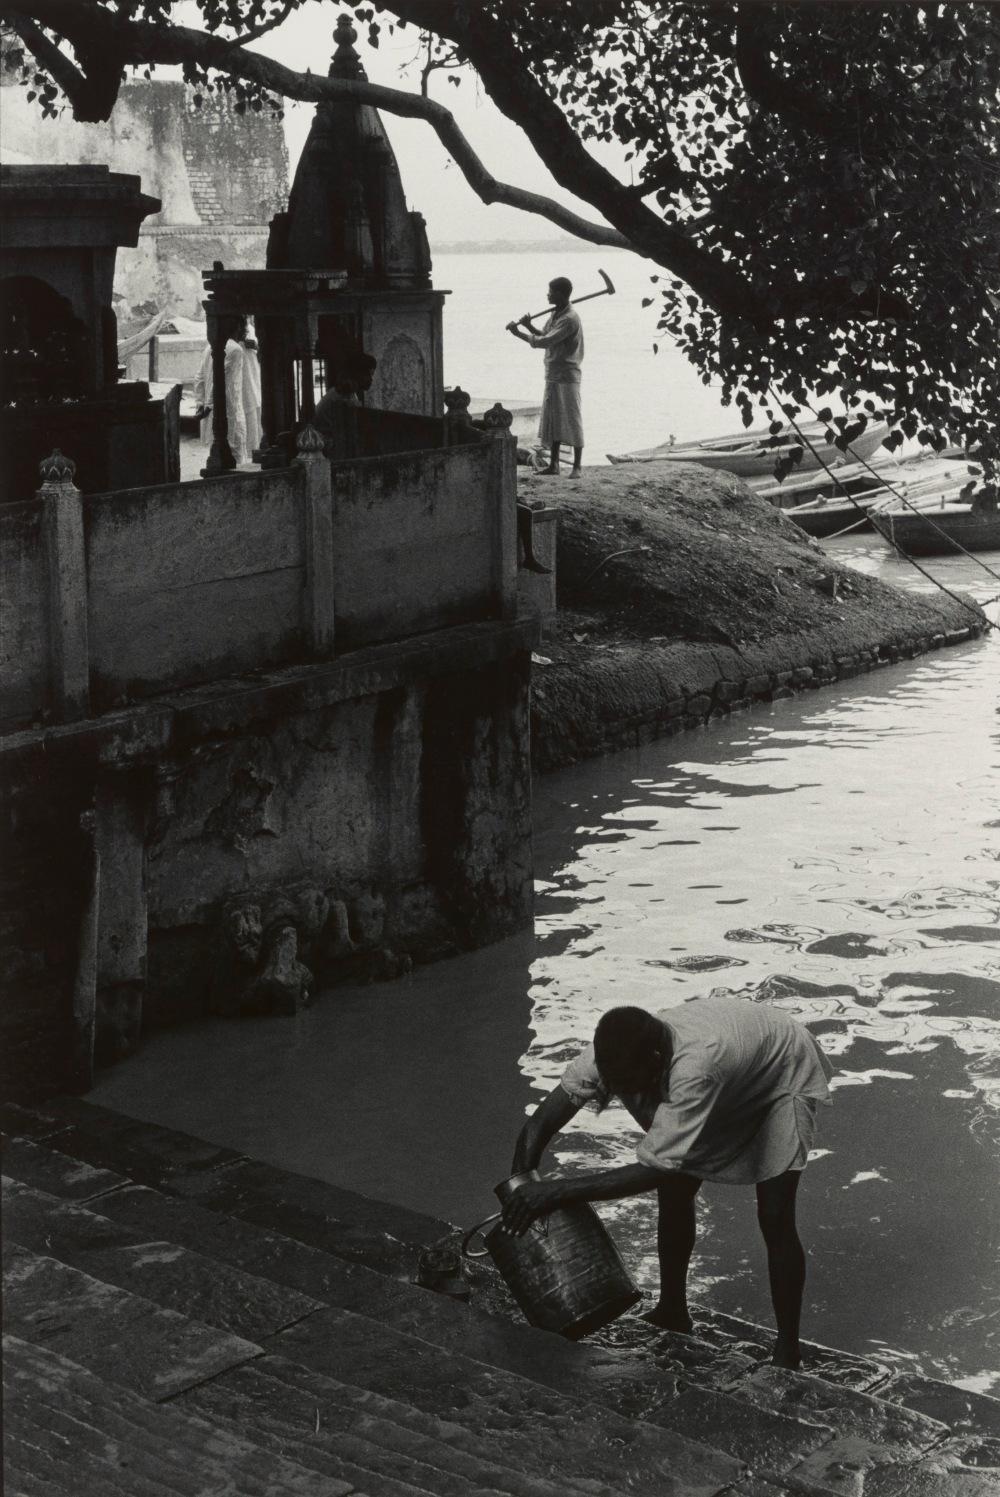 Benares 1970